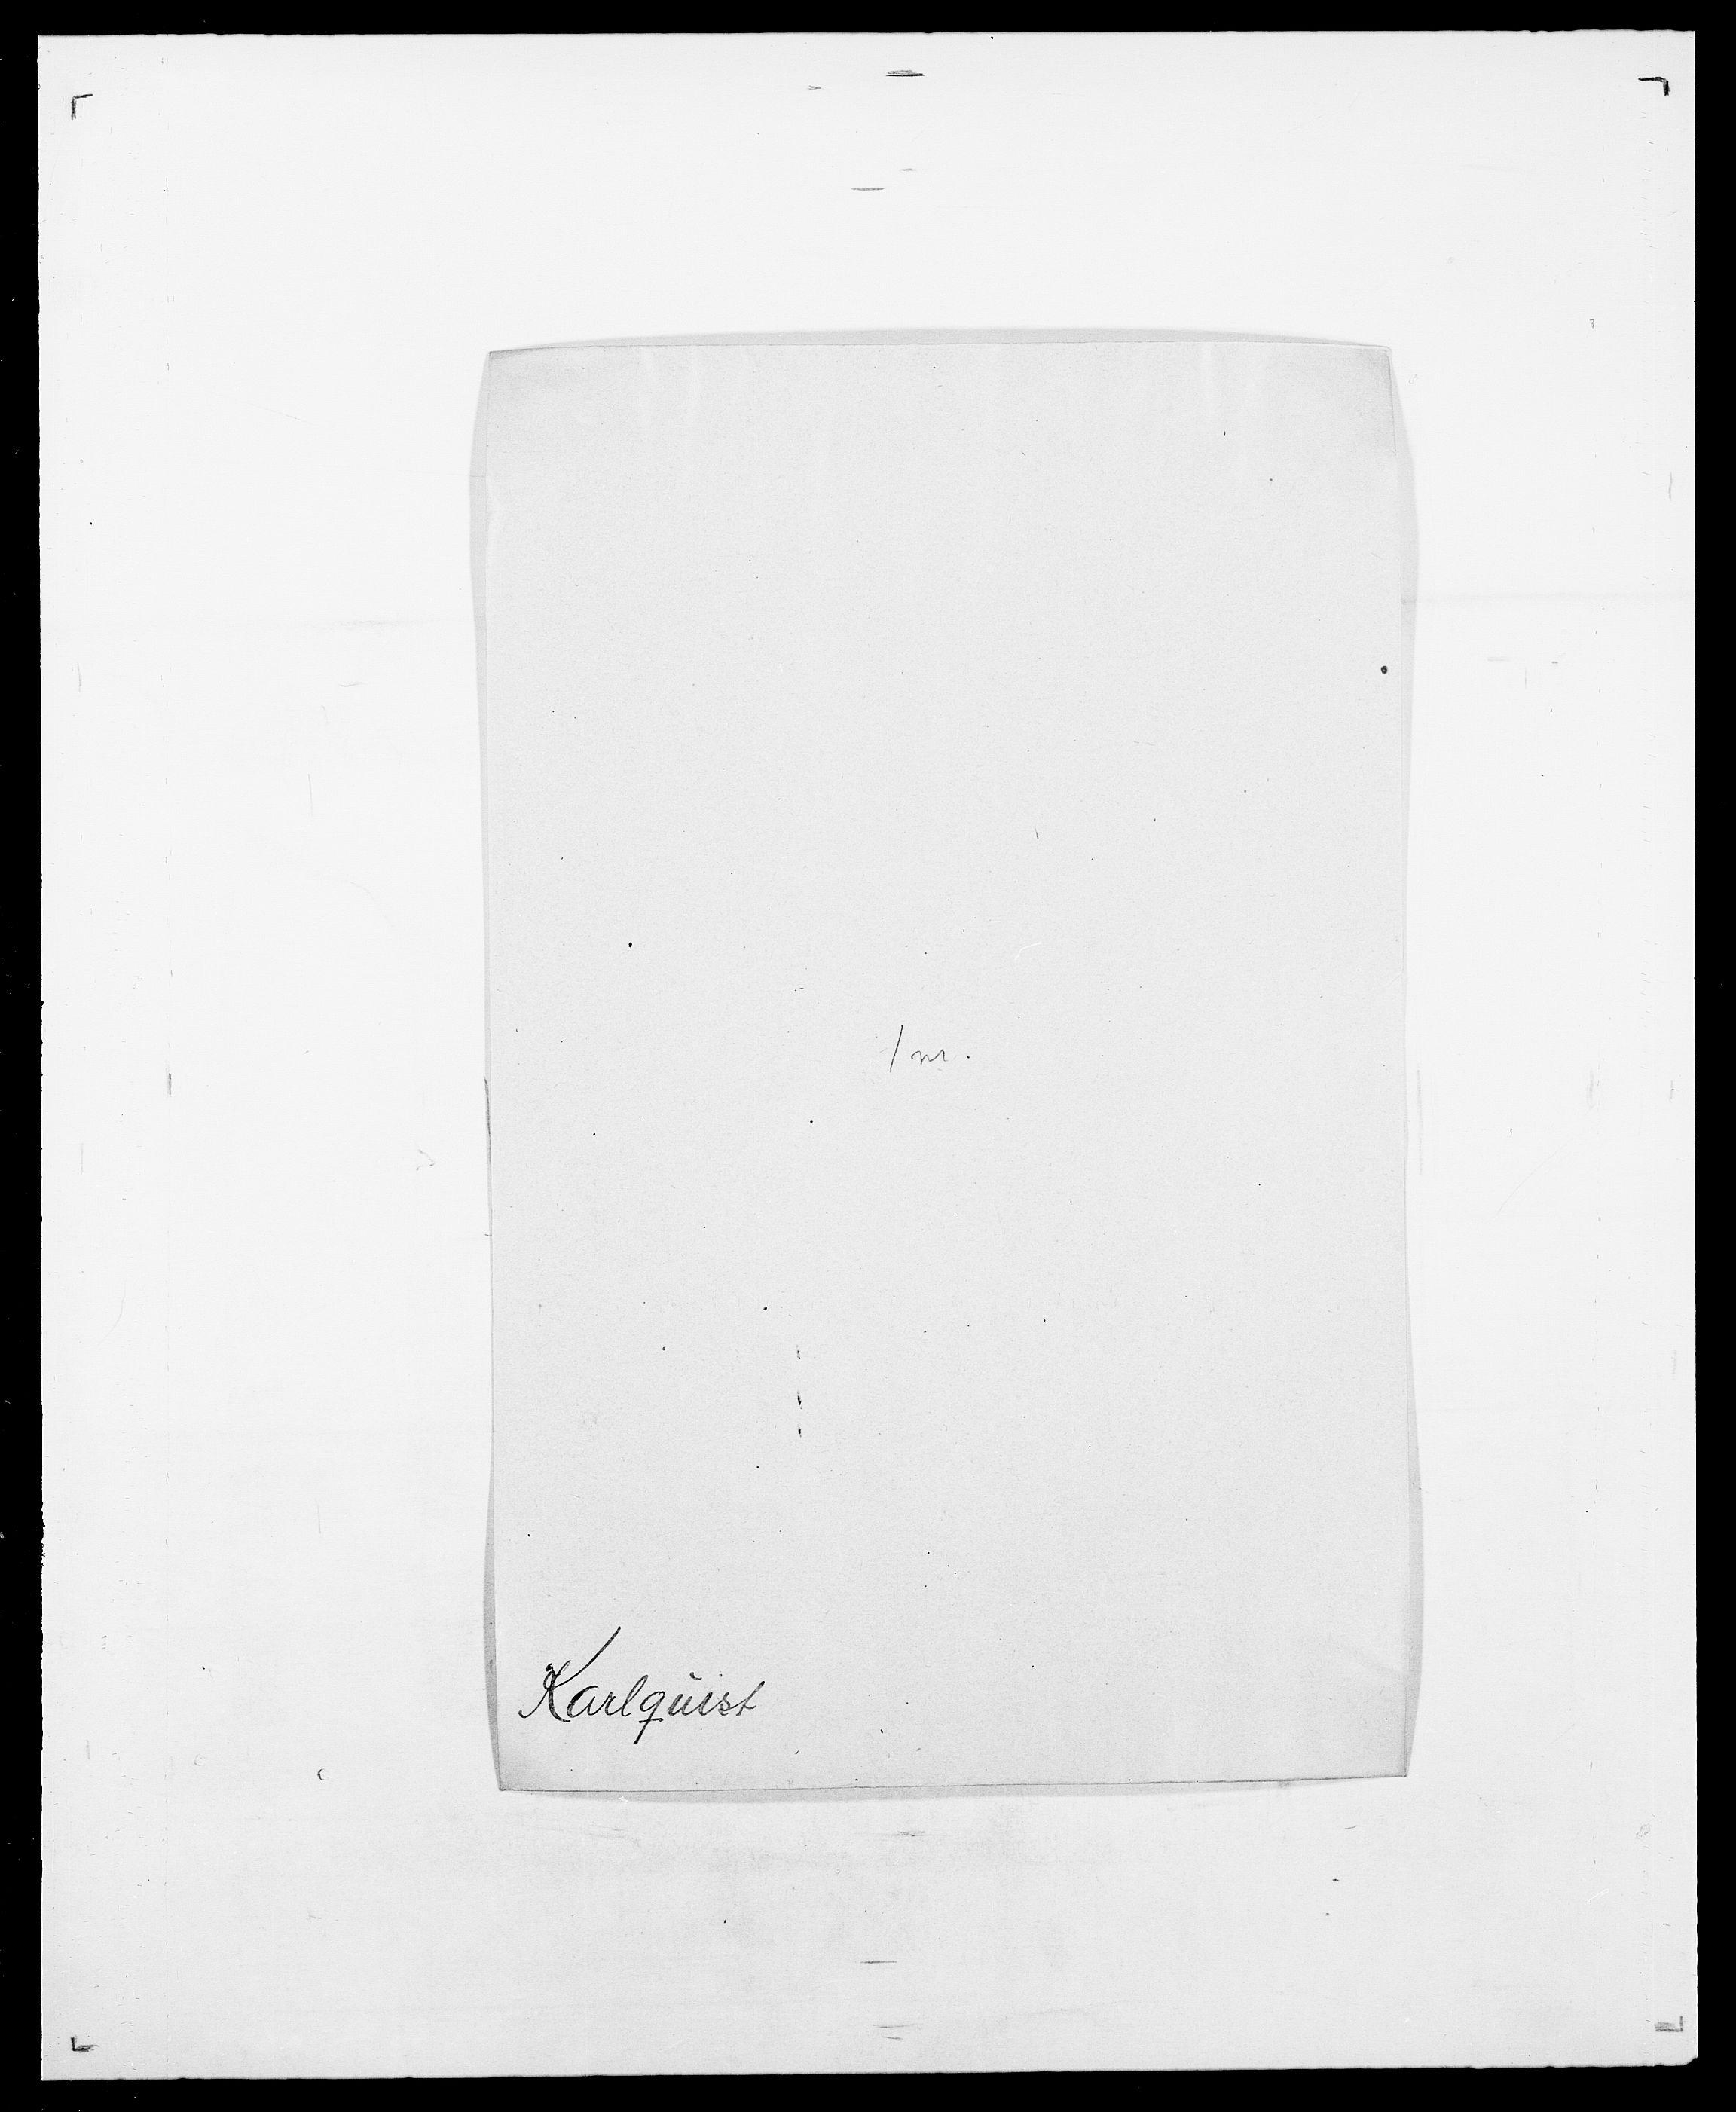 SAO, Delgobe, Charles Antoine - samling, D/Da/L0020: Irgens - Kjøsterud, s. 474